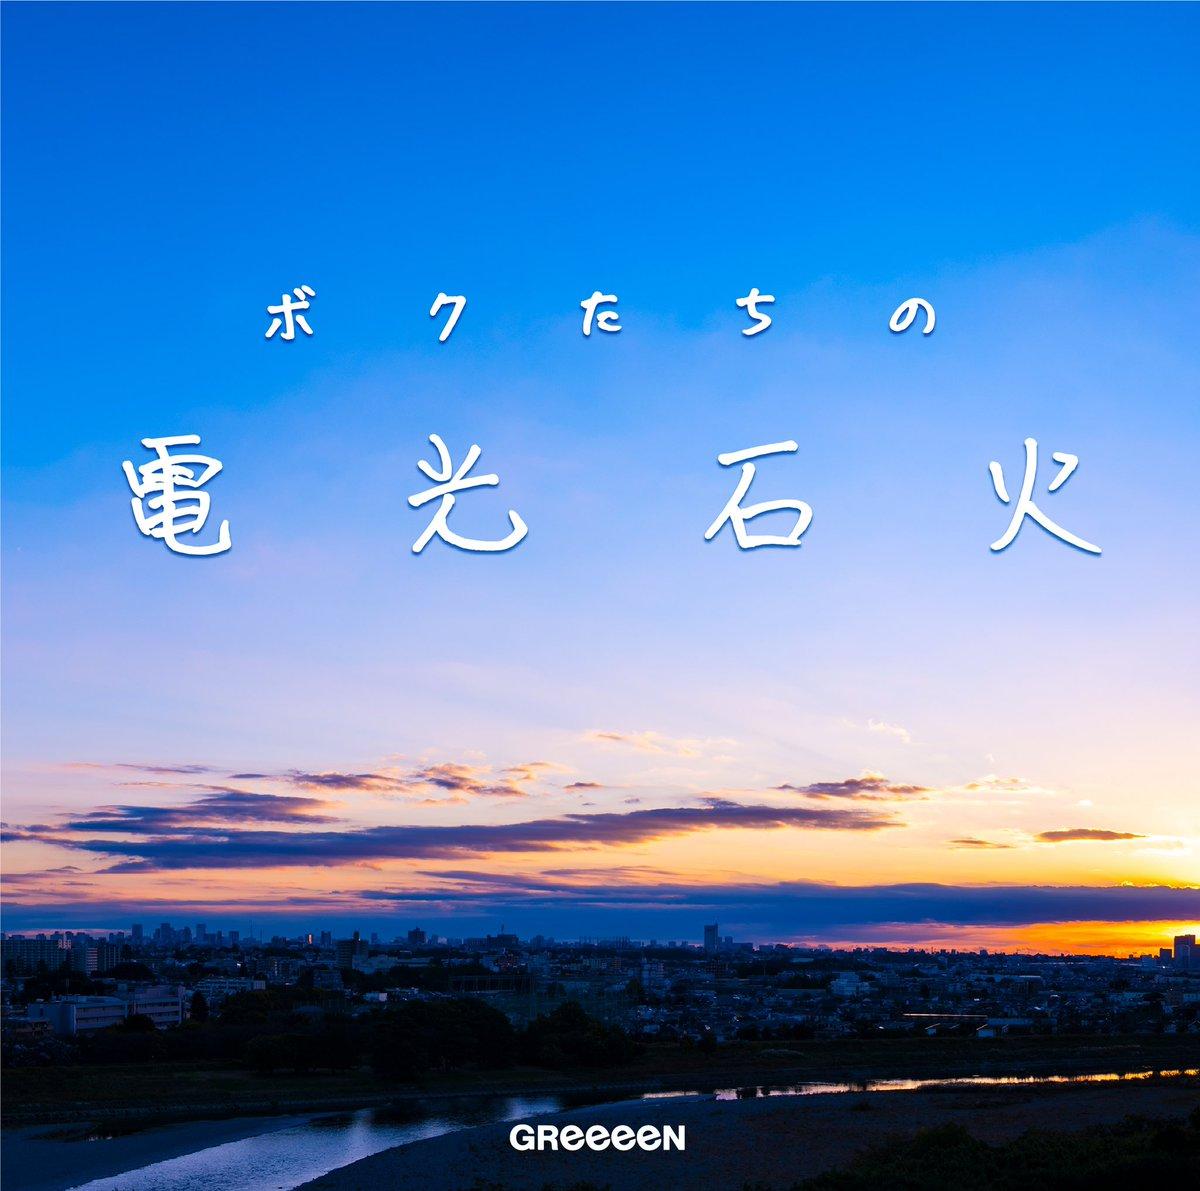 GReeeeN - ボクたちの電光石火 [2021.01.06+MP3+RAR]